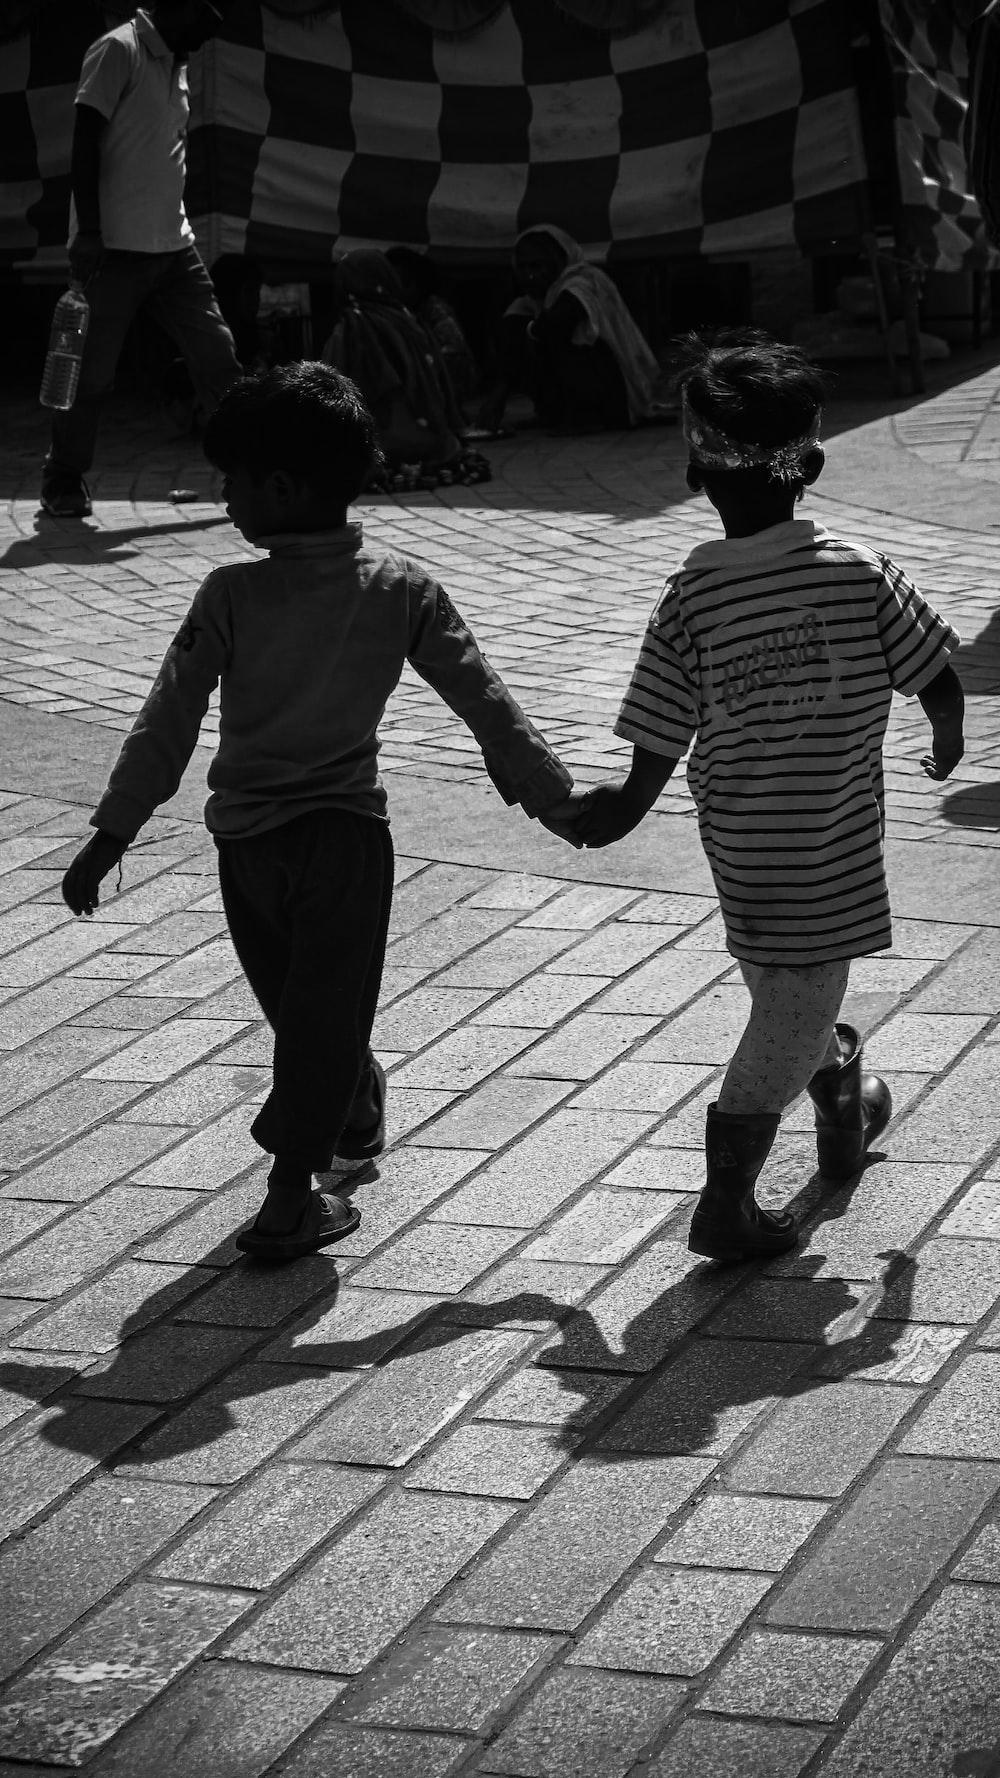 boy in black and white striped long sleeve shirt walking on sidewalk during daytime